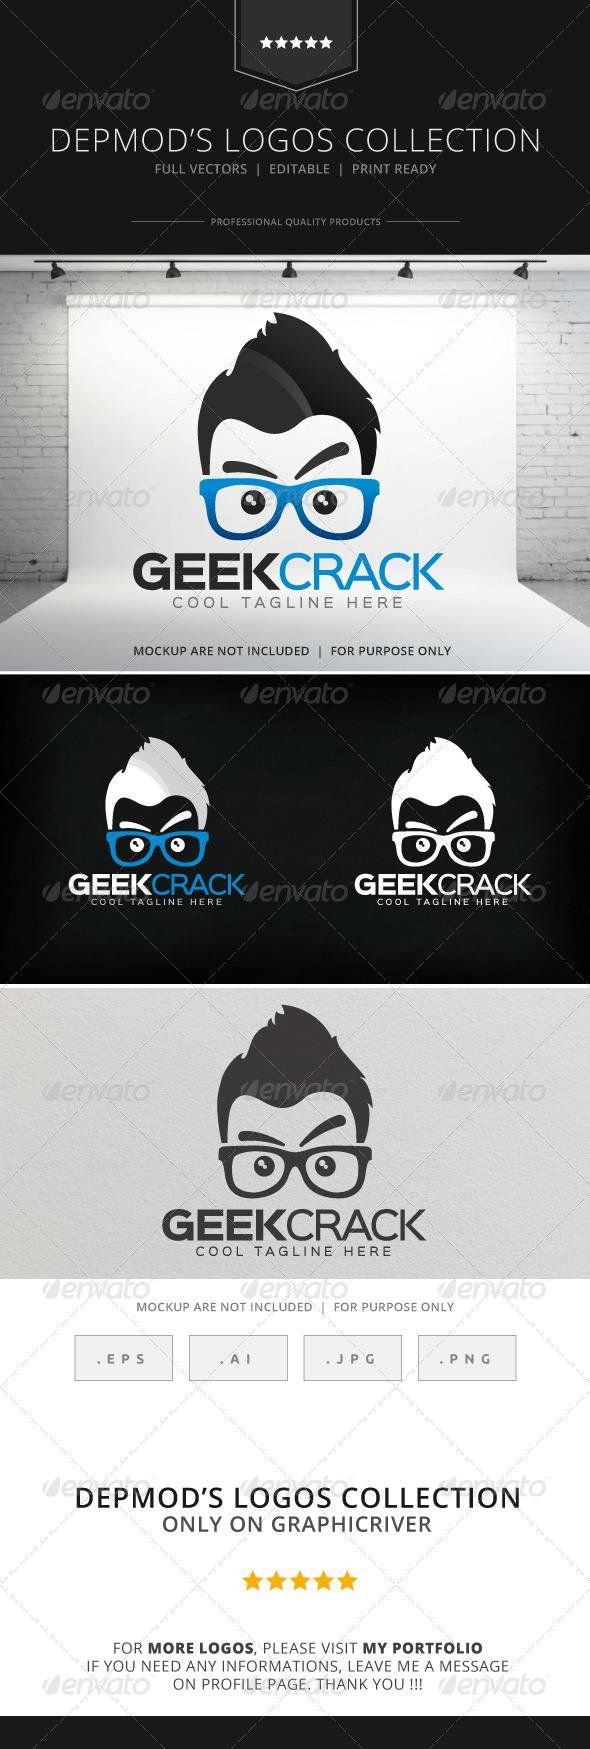 Geek Crack Logo